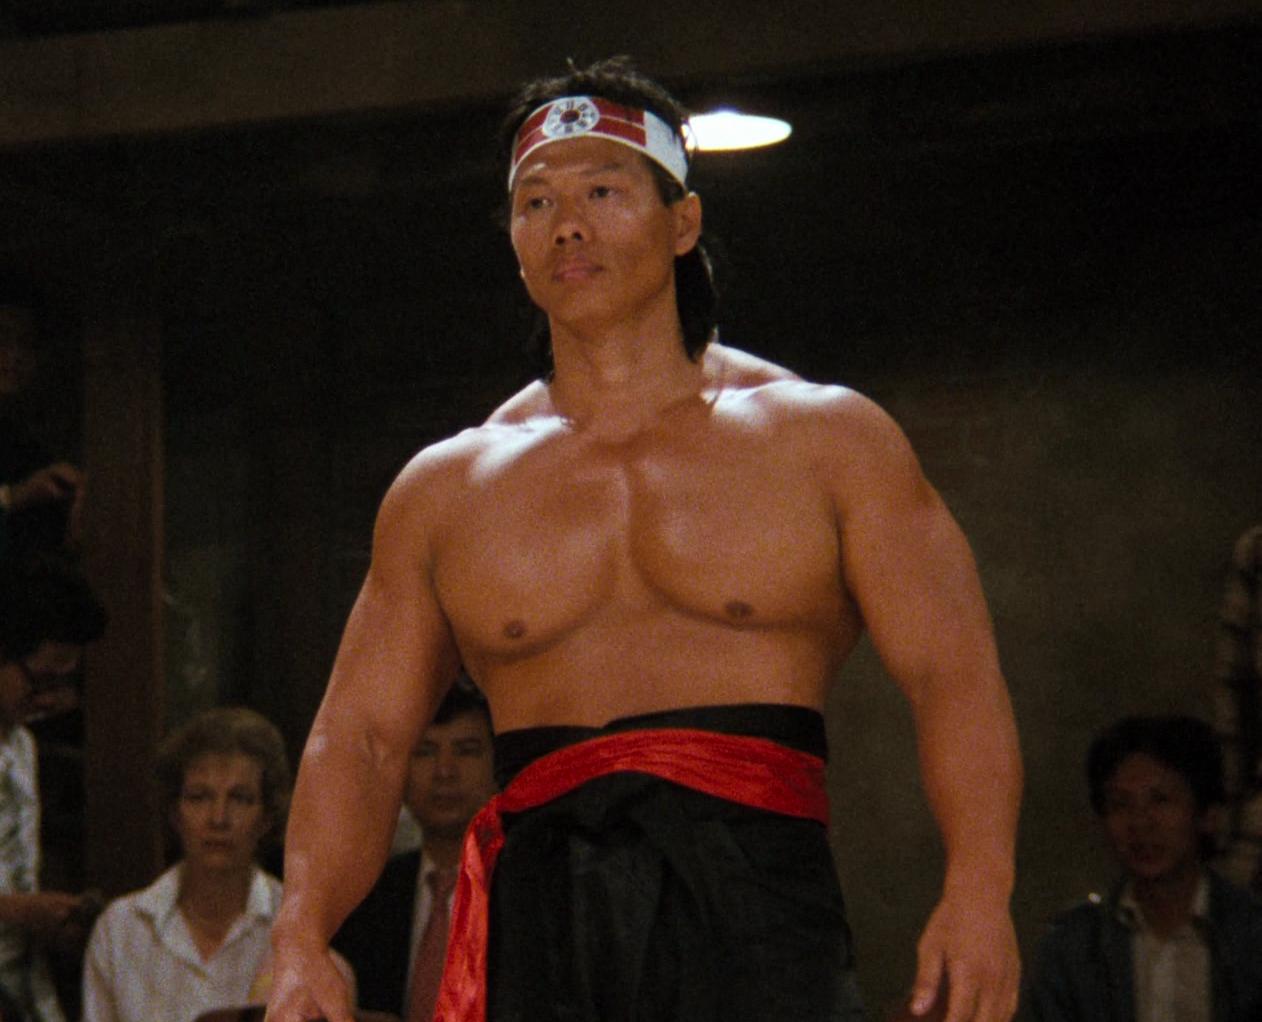 bloodsport chong li e1619078488260 25 Crotch-Punching Facts About Jean-Claude Van Damme's 1988 Film Bloodsport